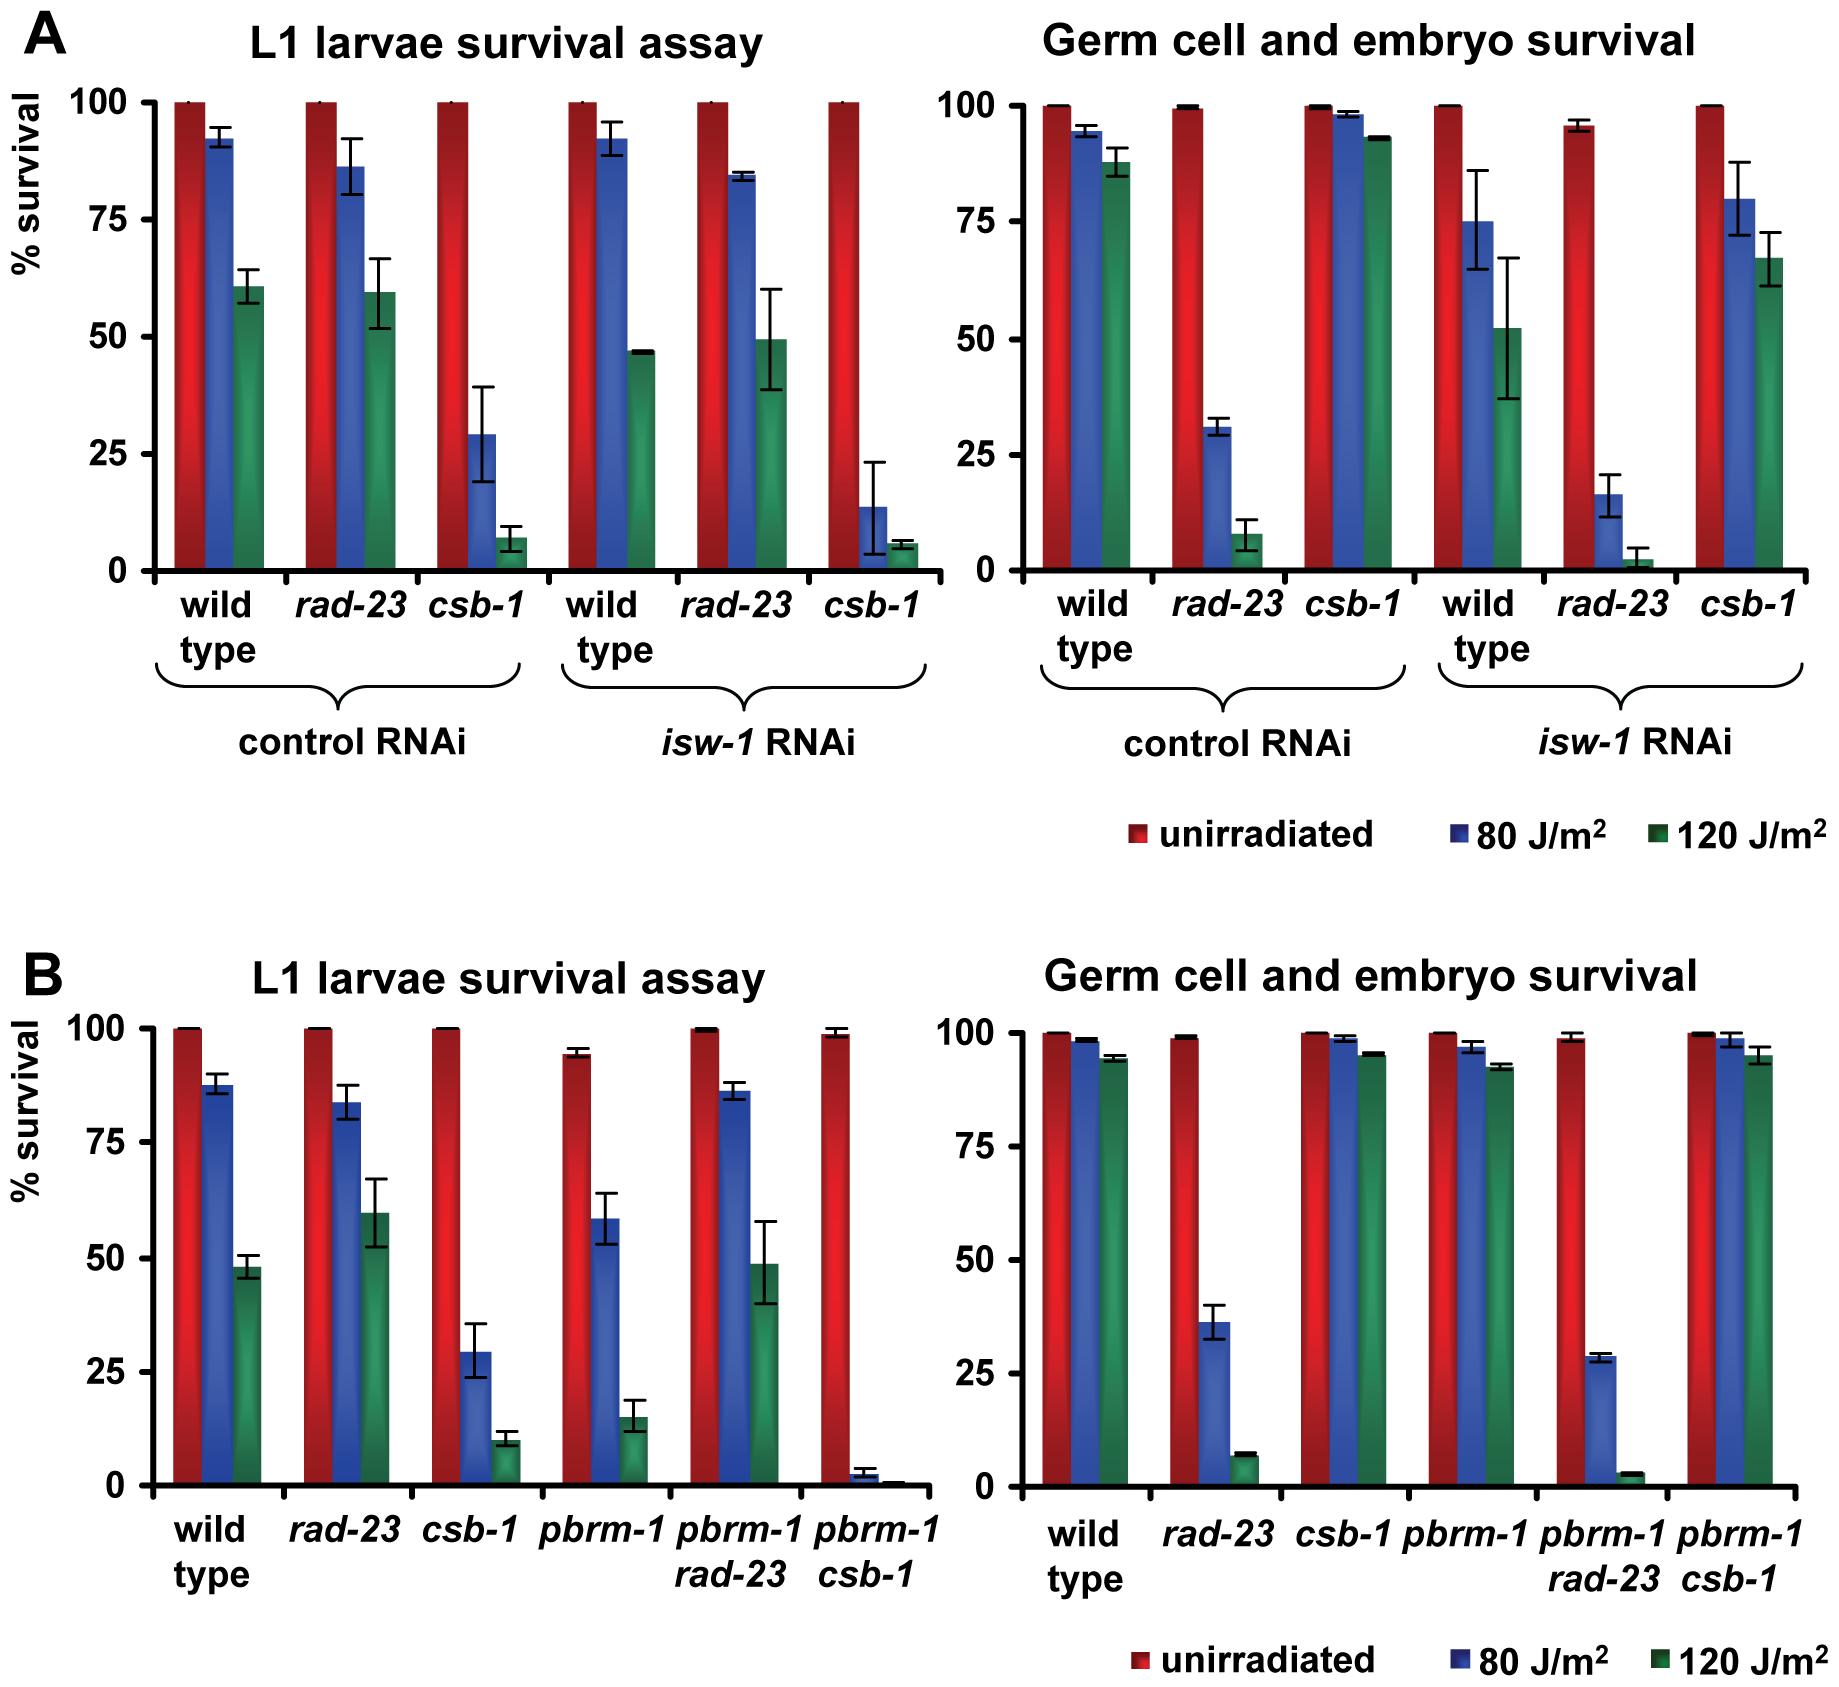 Genetic interactions of <i>isw-1</i> and <i>pbrm-1</i> with <i>rad-23</i> and <i>csb-1</i>.